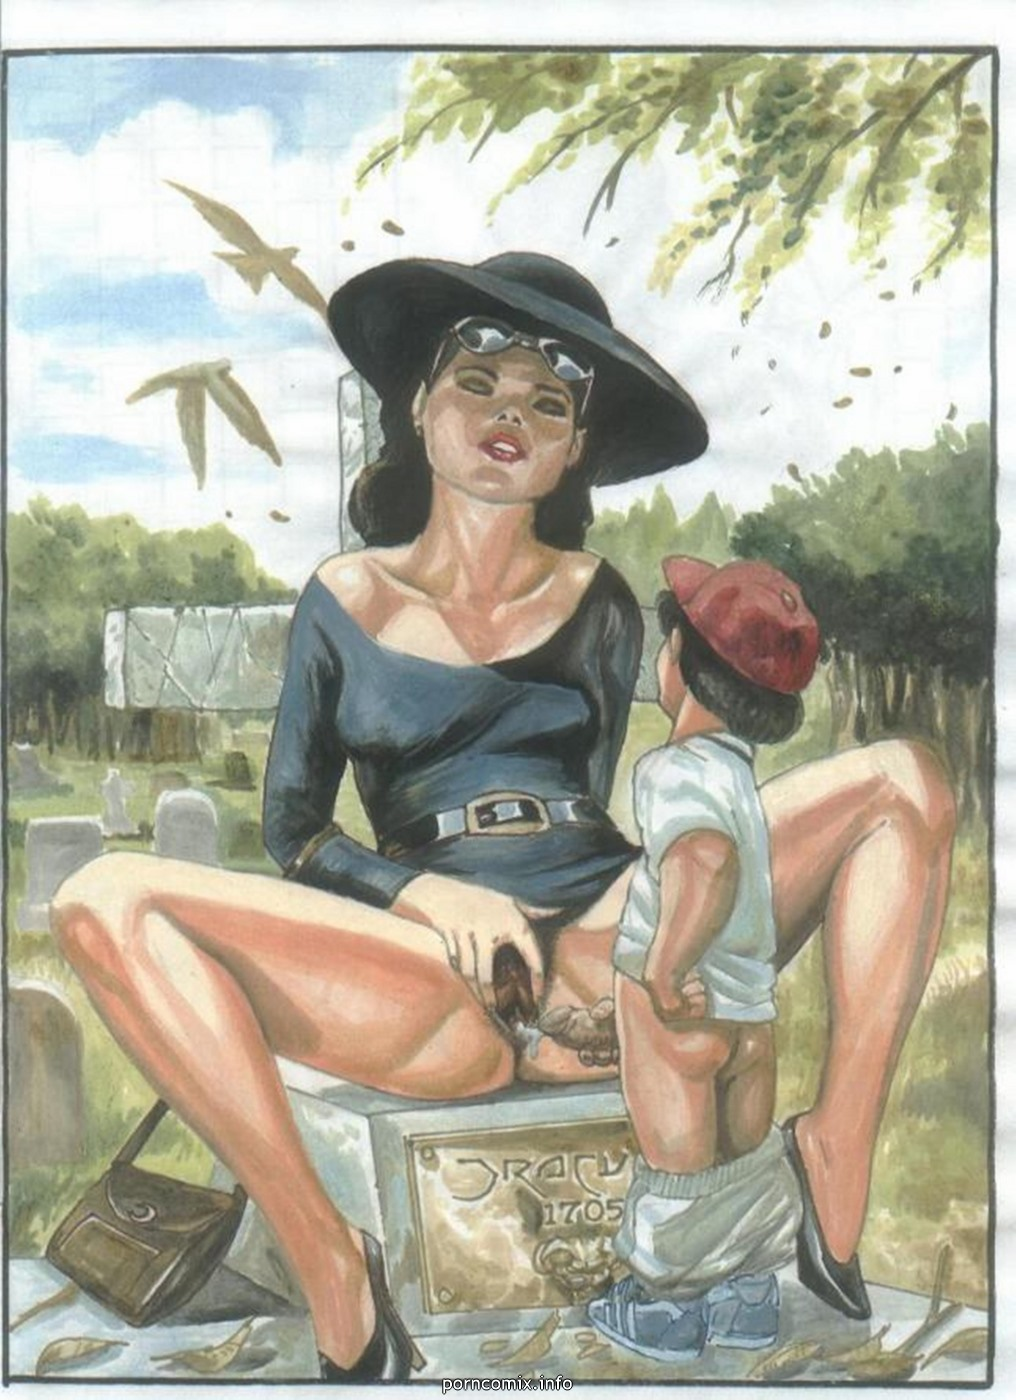 son xxx classic paintings mom